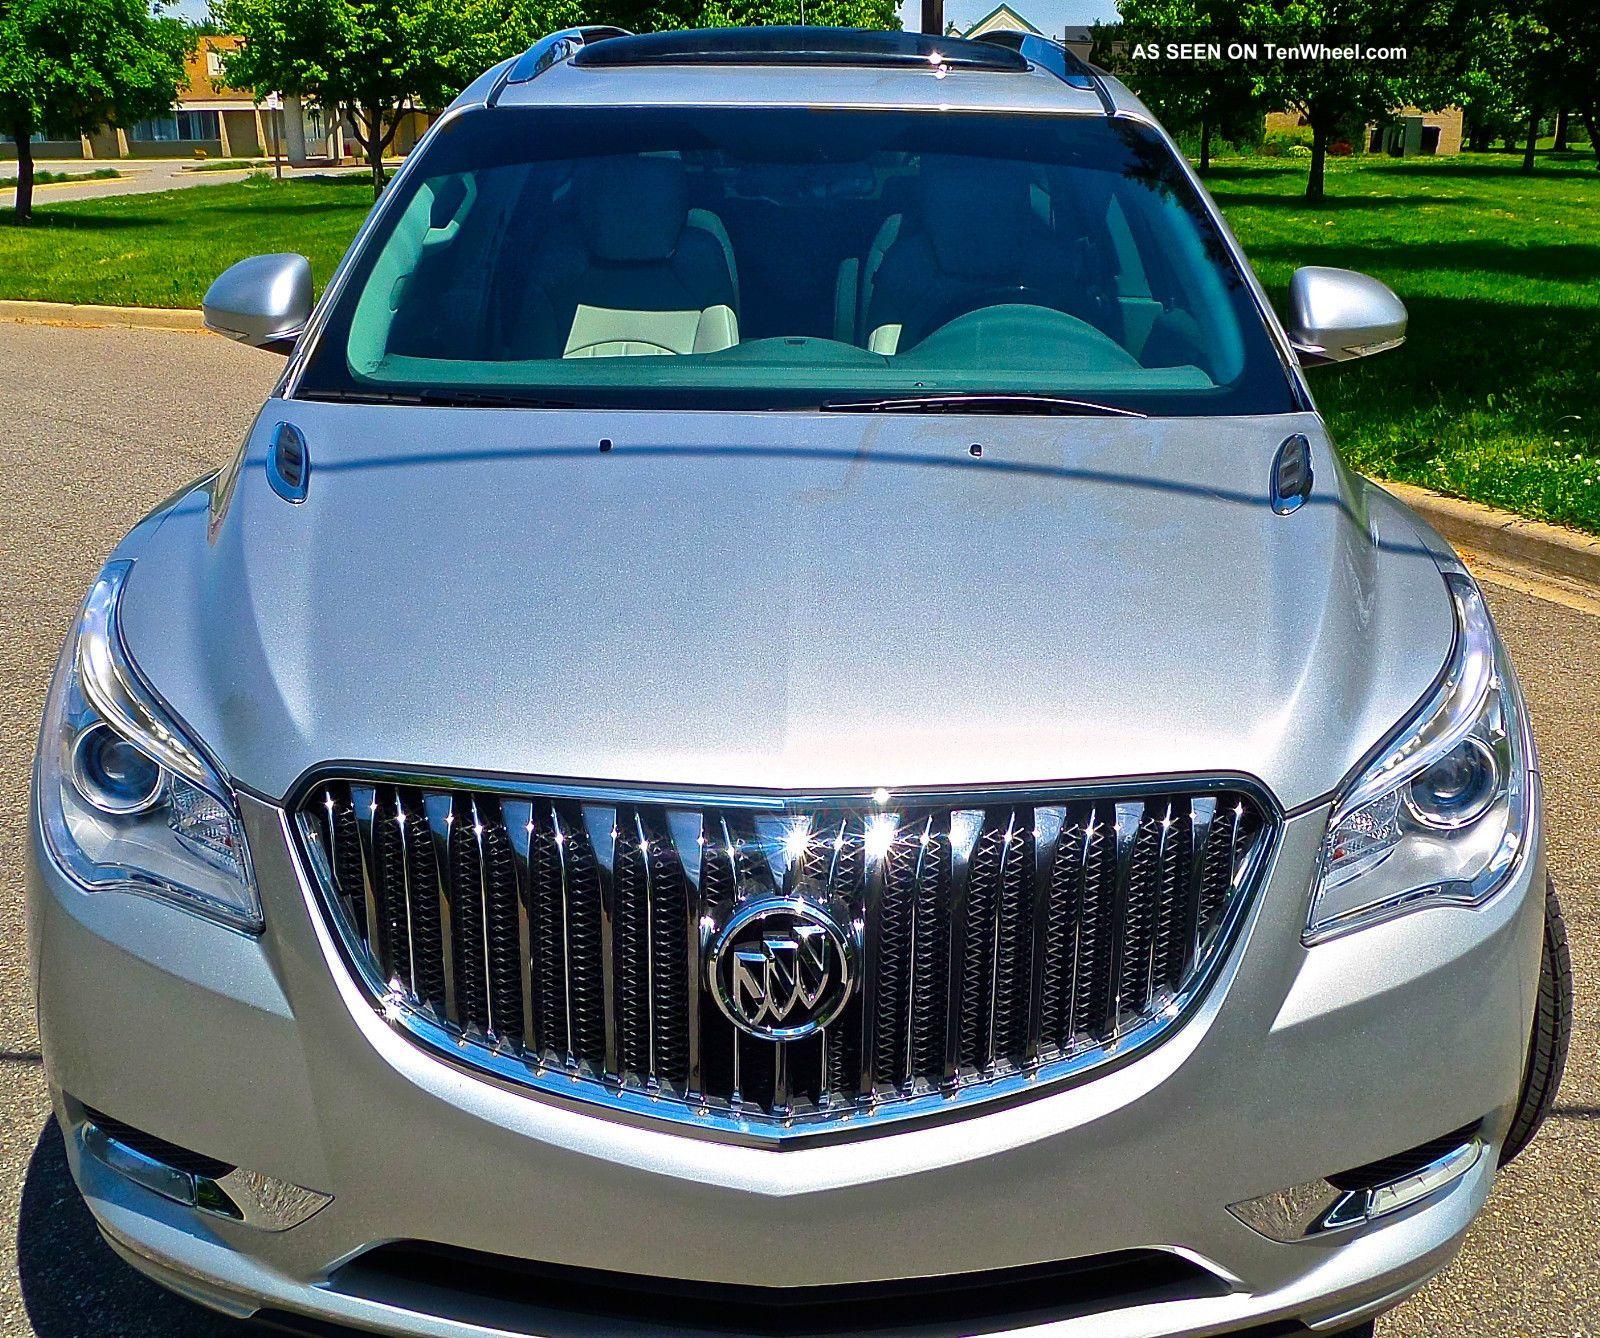 2013 Buicks: 2013 Buick Enclave / / / Rear Camera / Blis / Park Assist